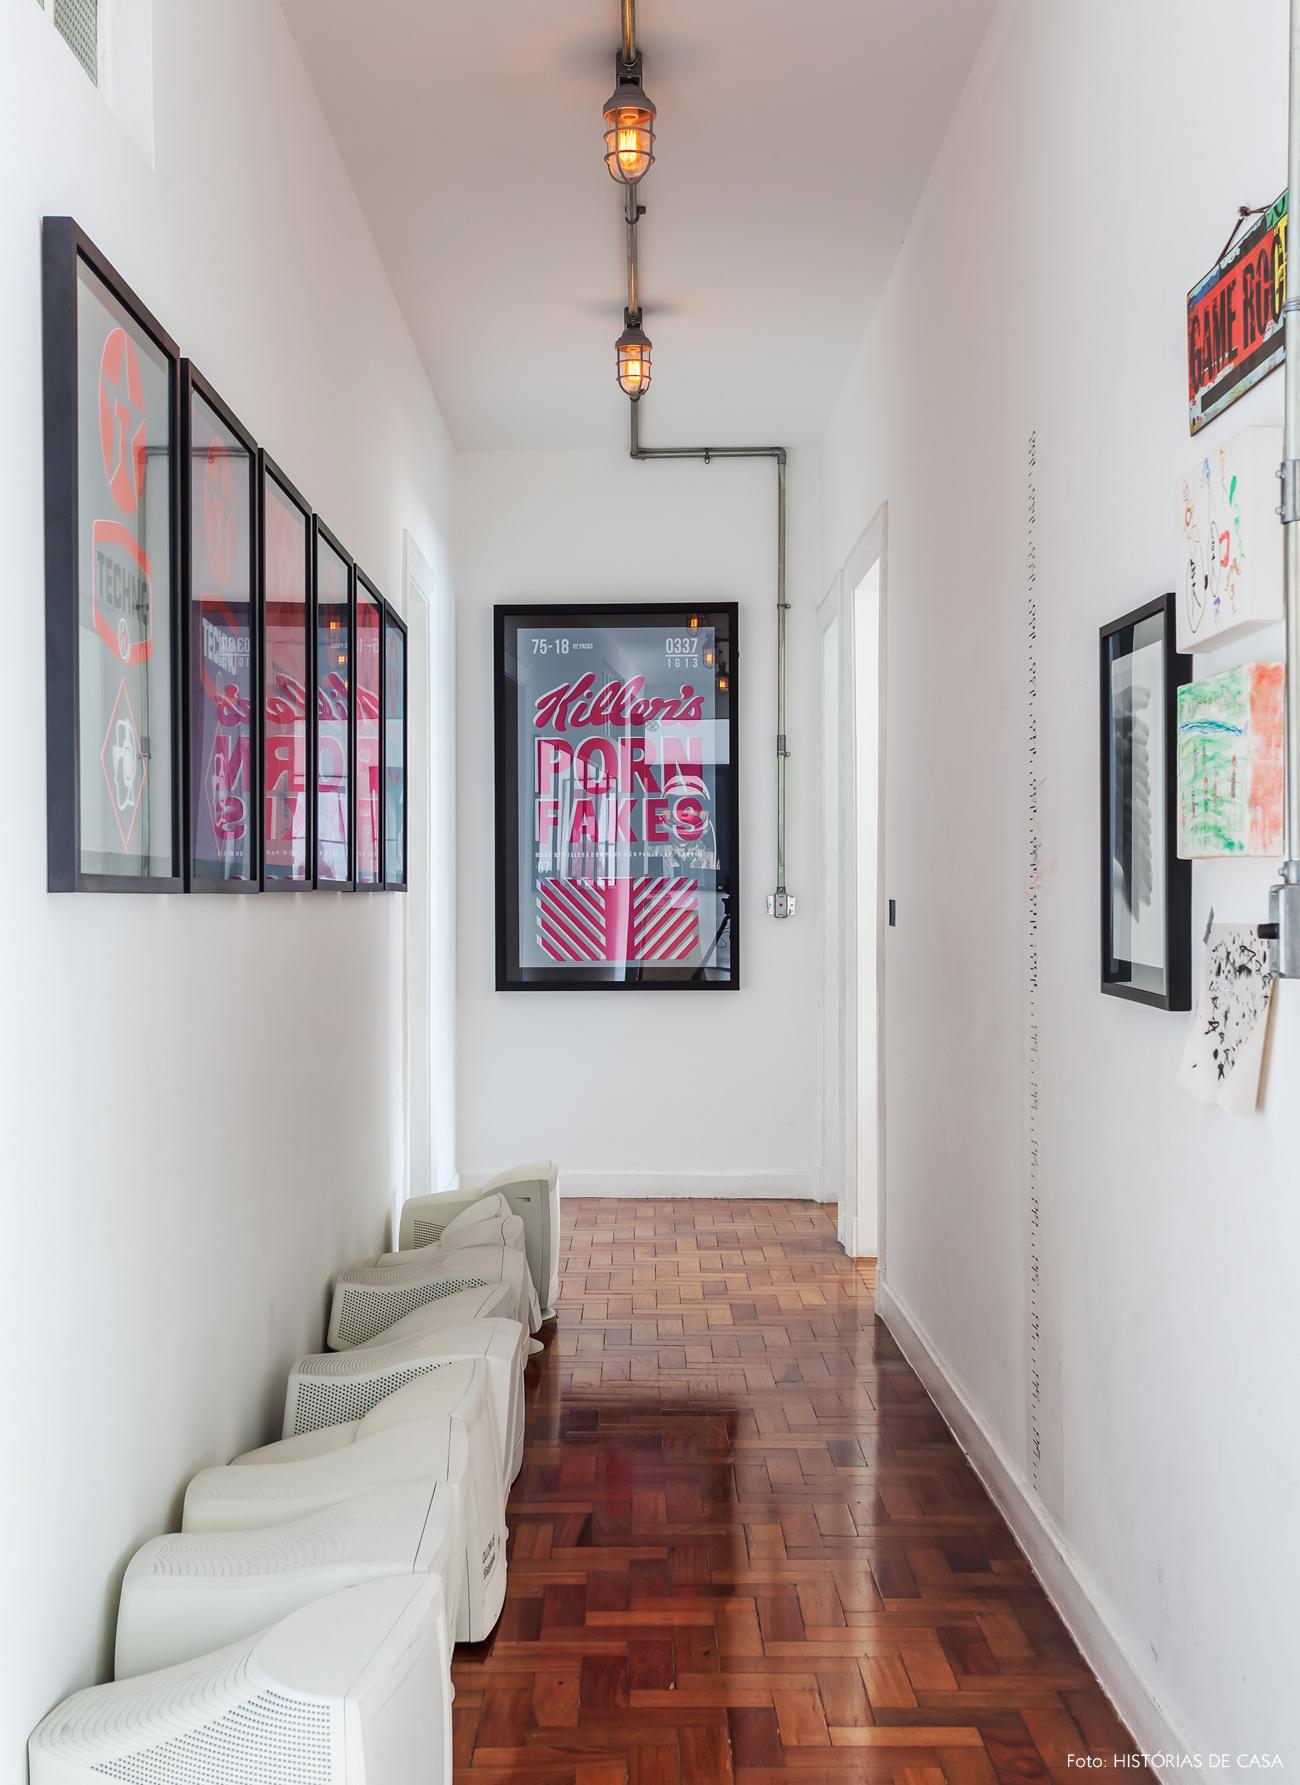 30-decoracao-apartamento-julia-morelli-obras-de-arte-corredor